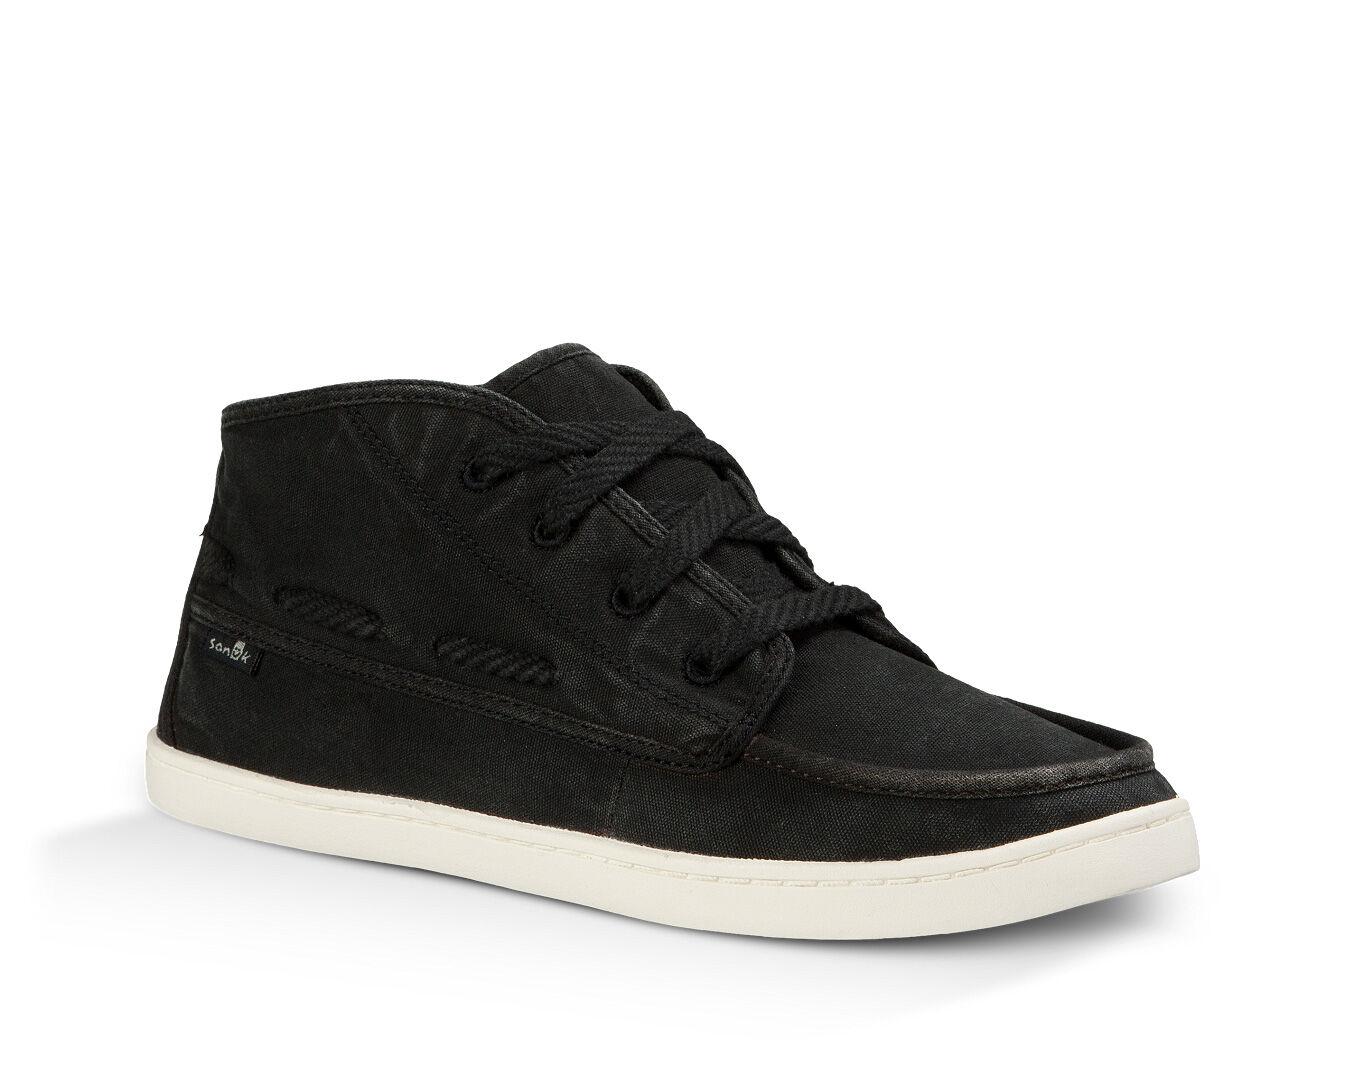 Womens Athletic Shoes sanuk olive vee k shawn ll4k57w9